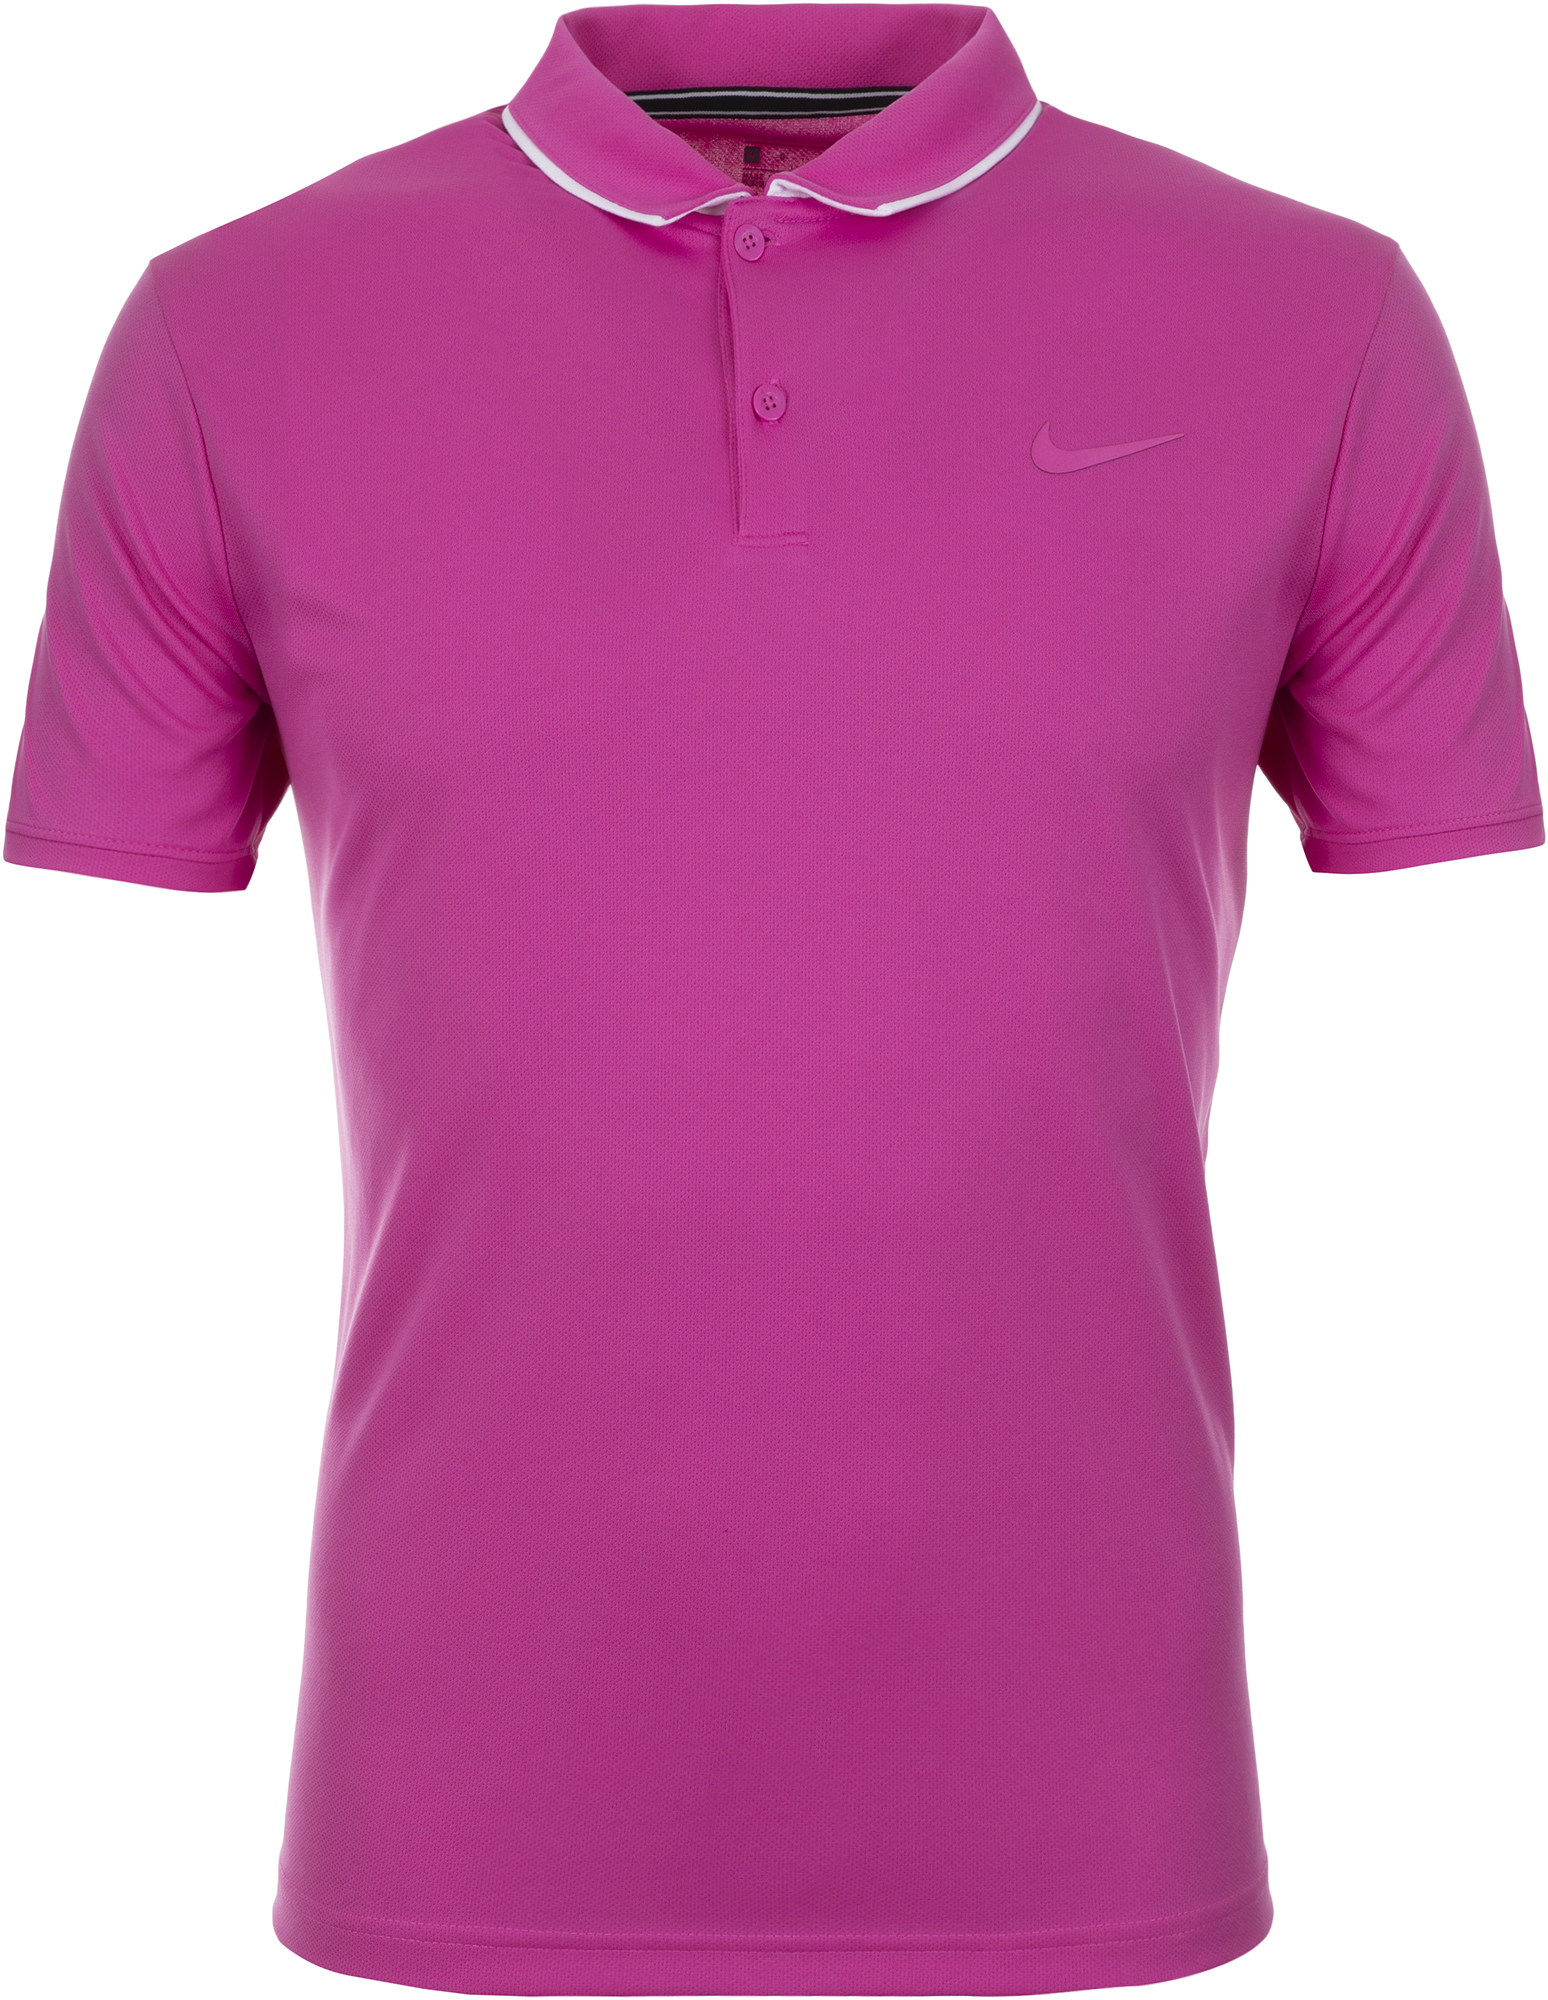 цена Nike Поло мужское Nike Dry, размер 46-48 онлайн в 2017 году